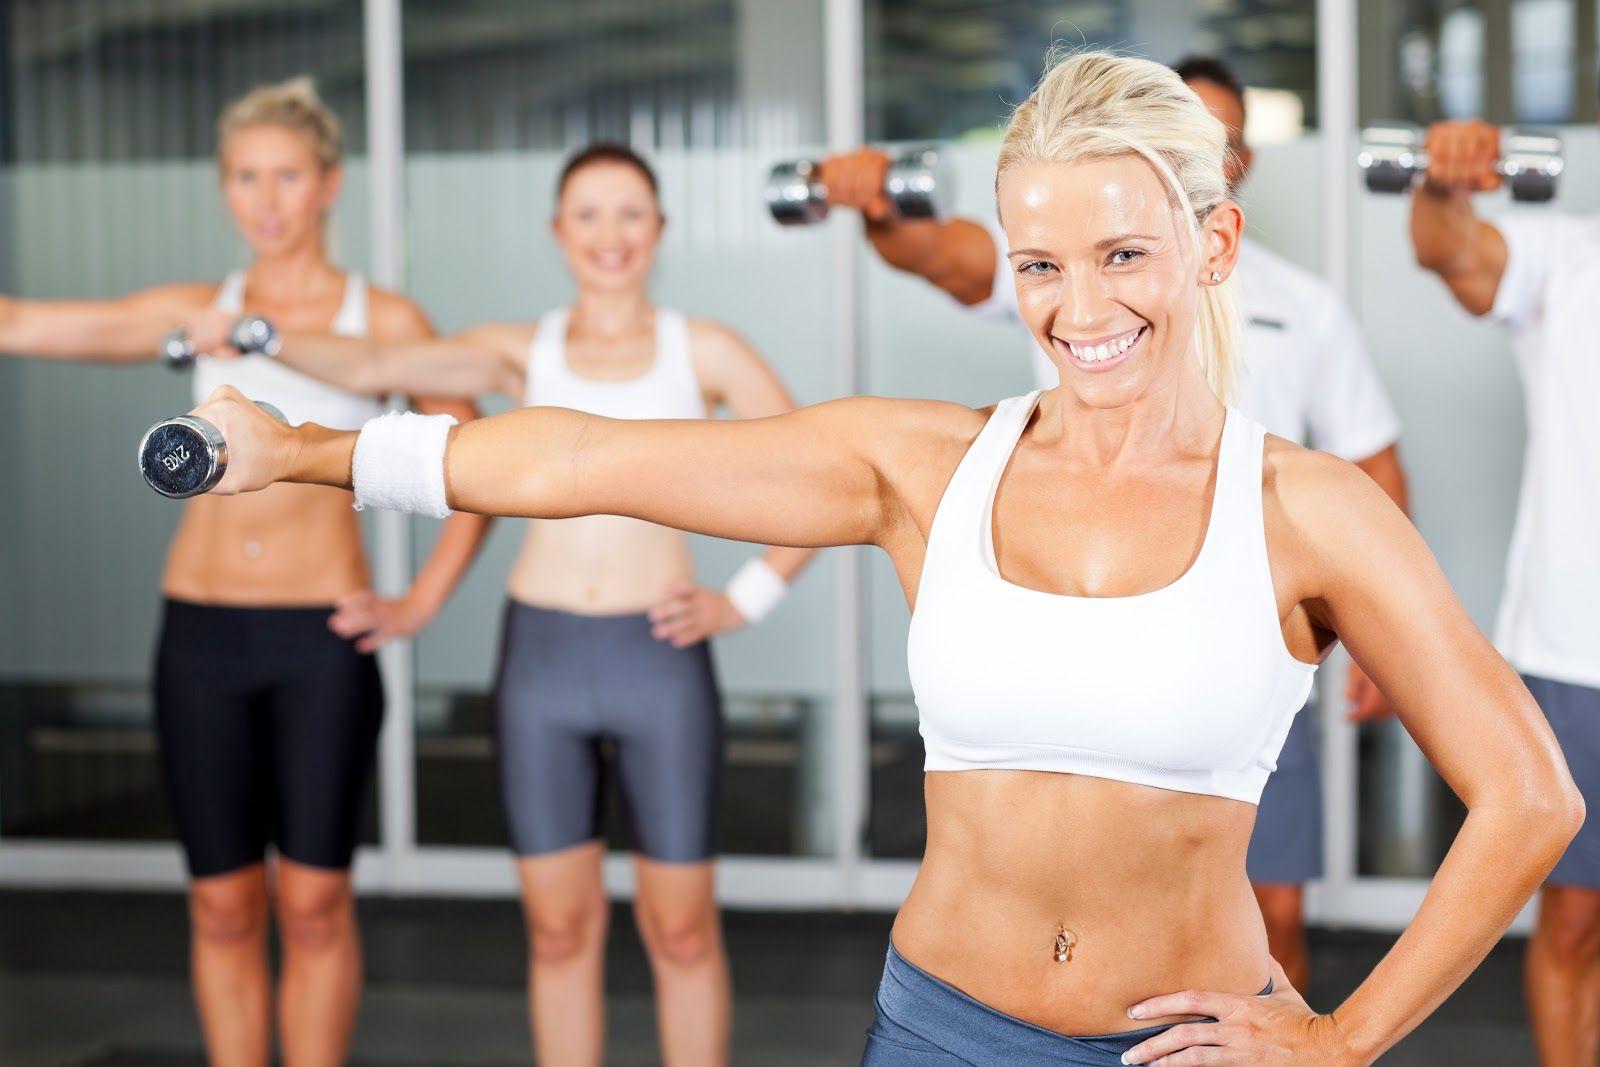 Gym Management Software Has An Inbuilt Health Club